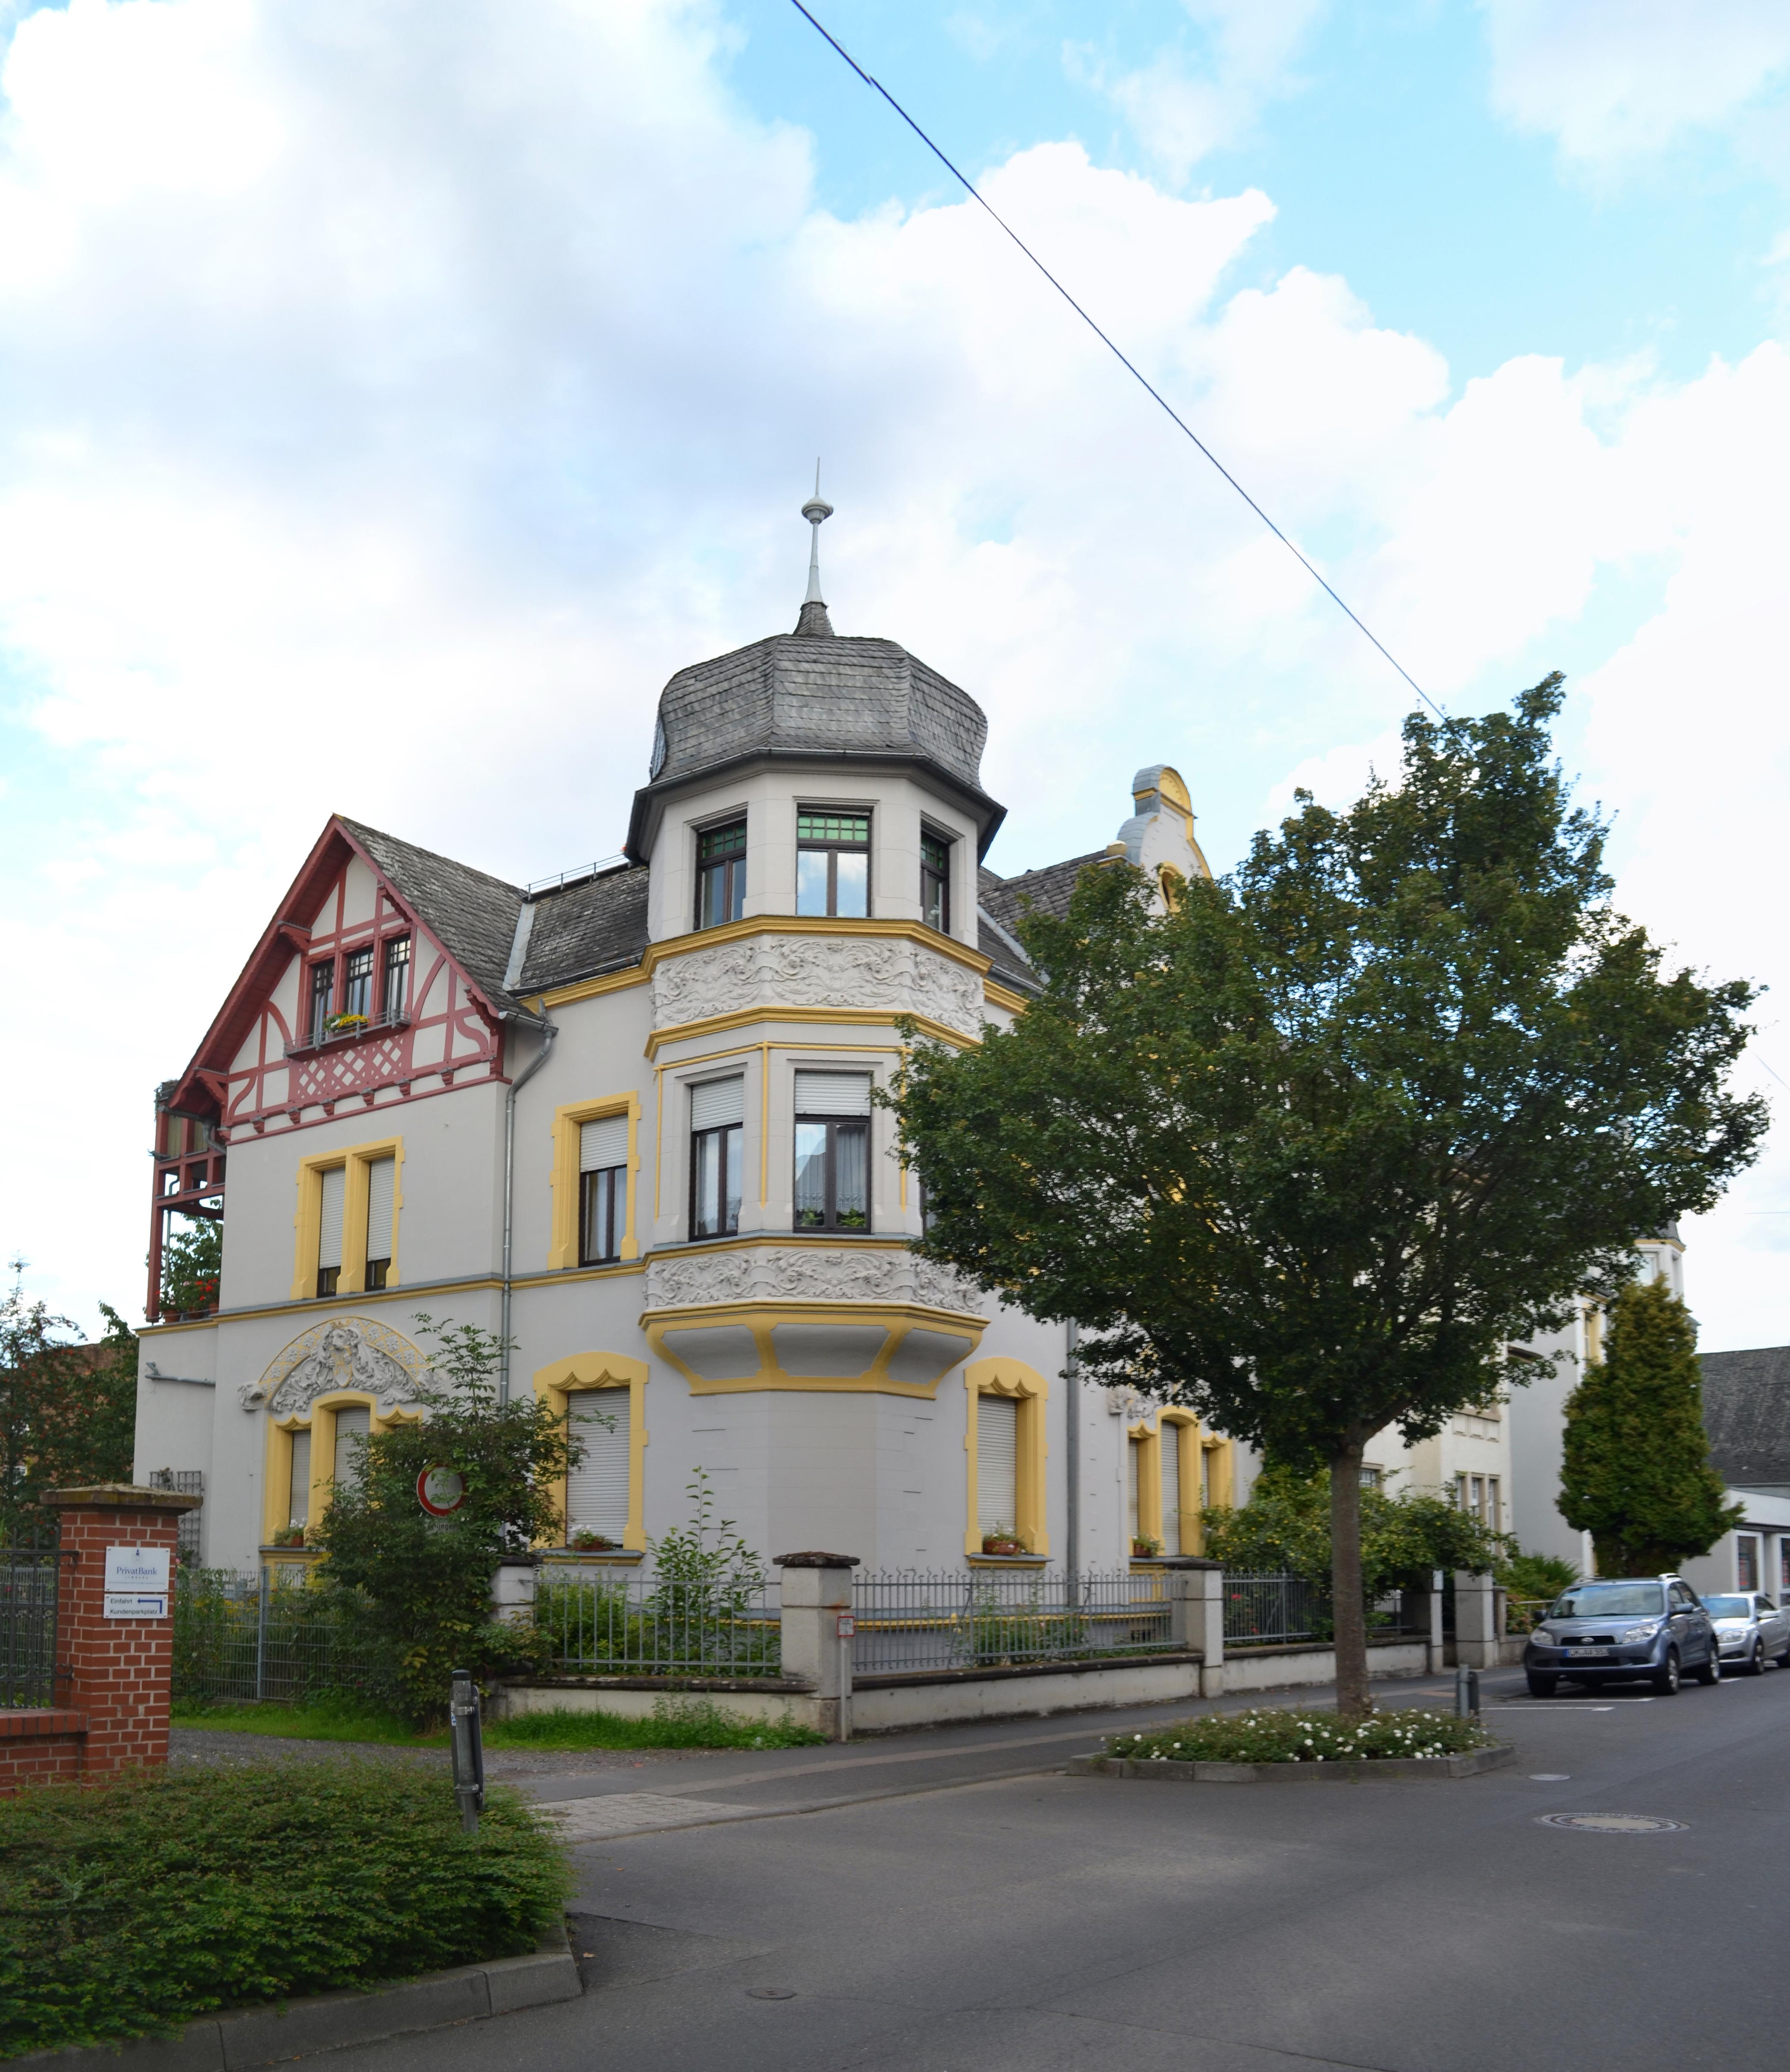 File:Limburg. Parkstraße 6 (1).jpg